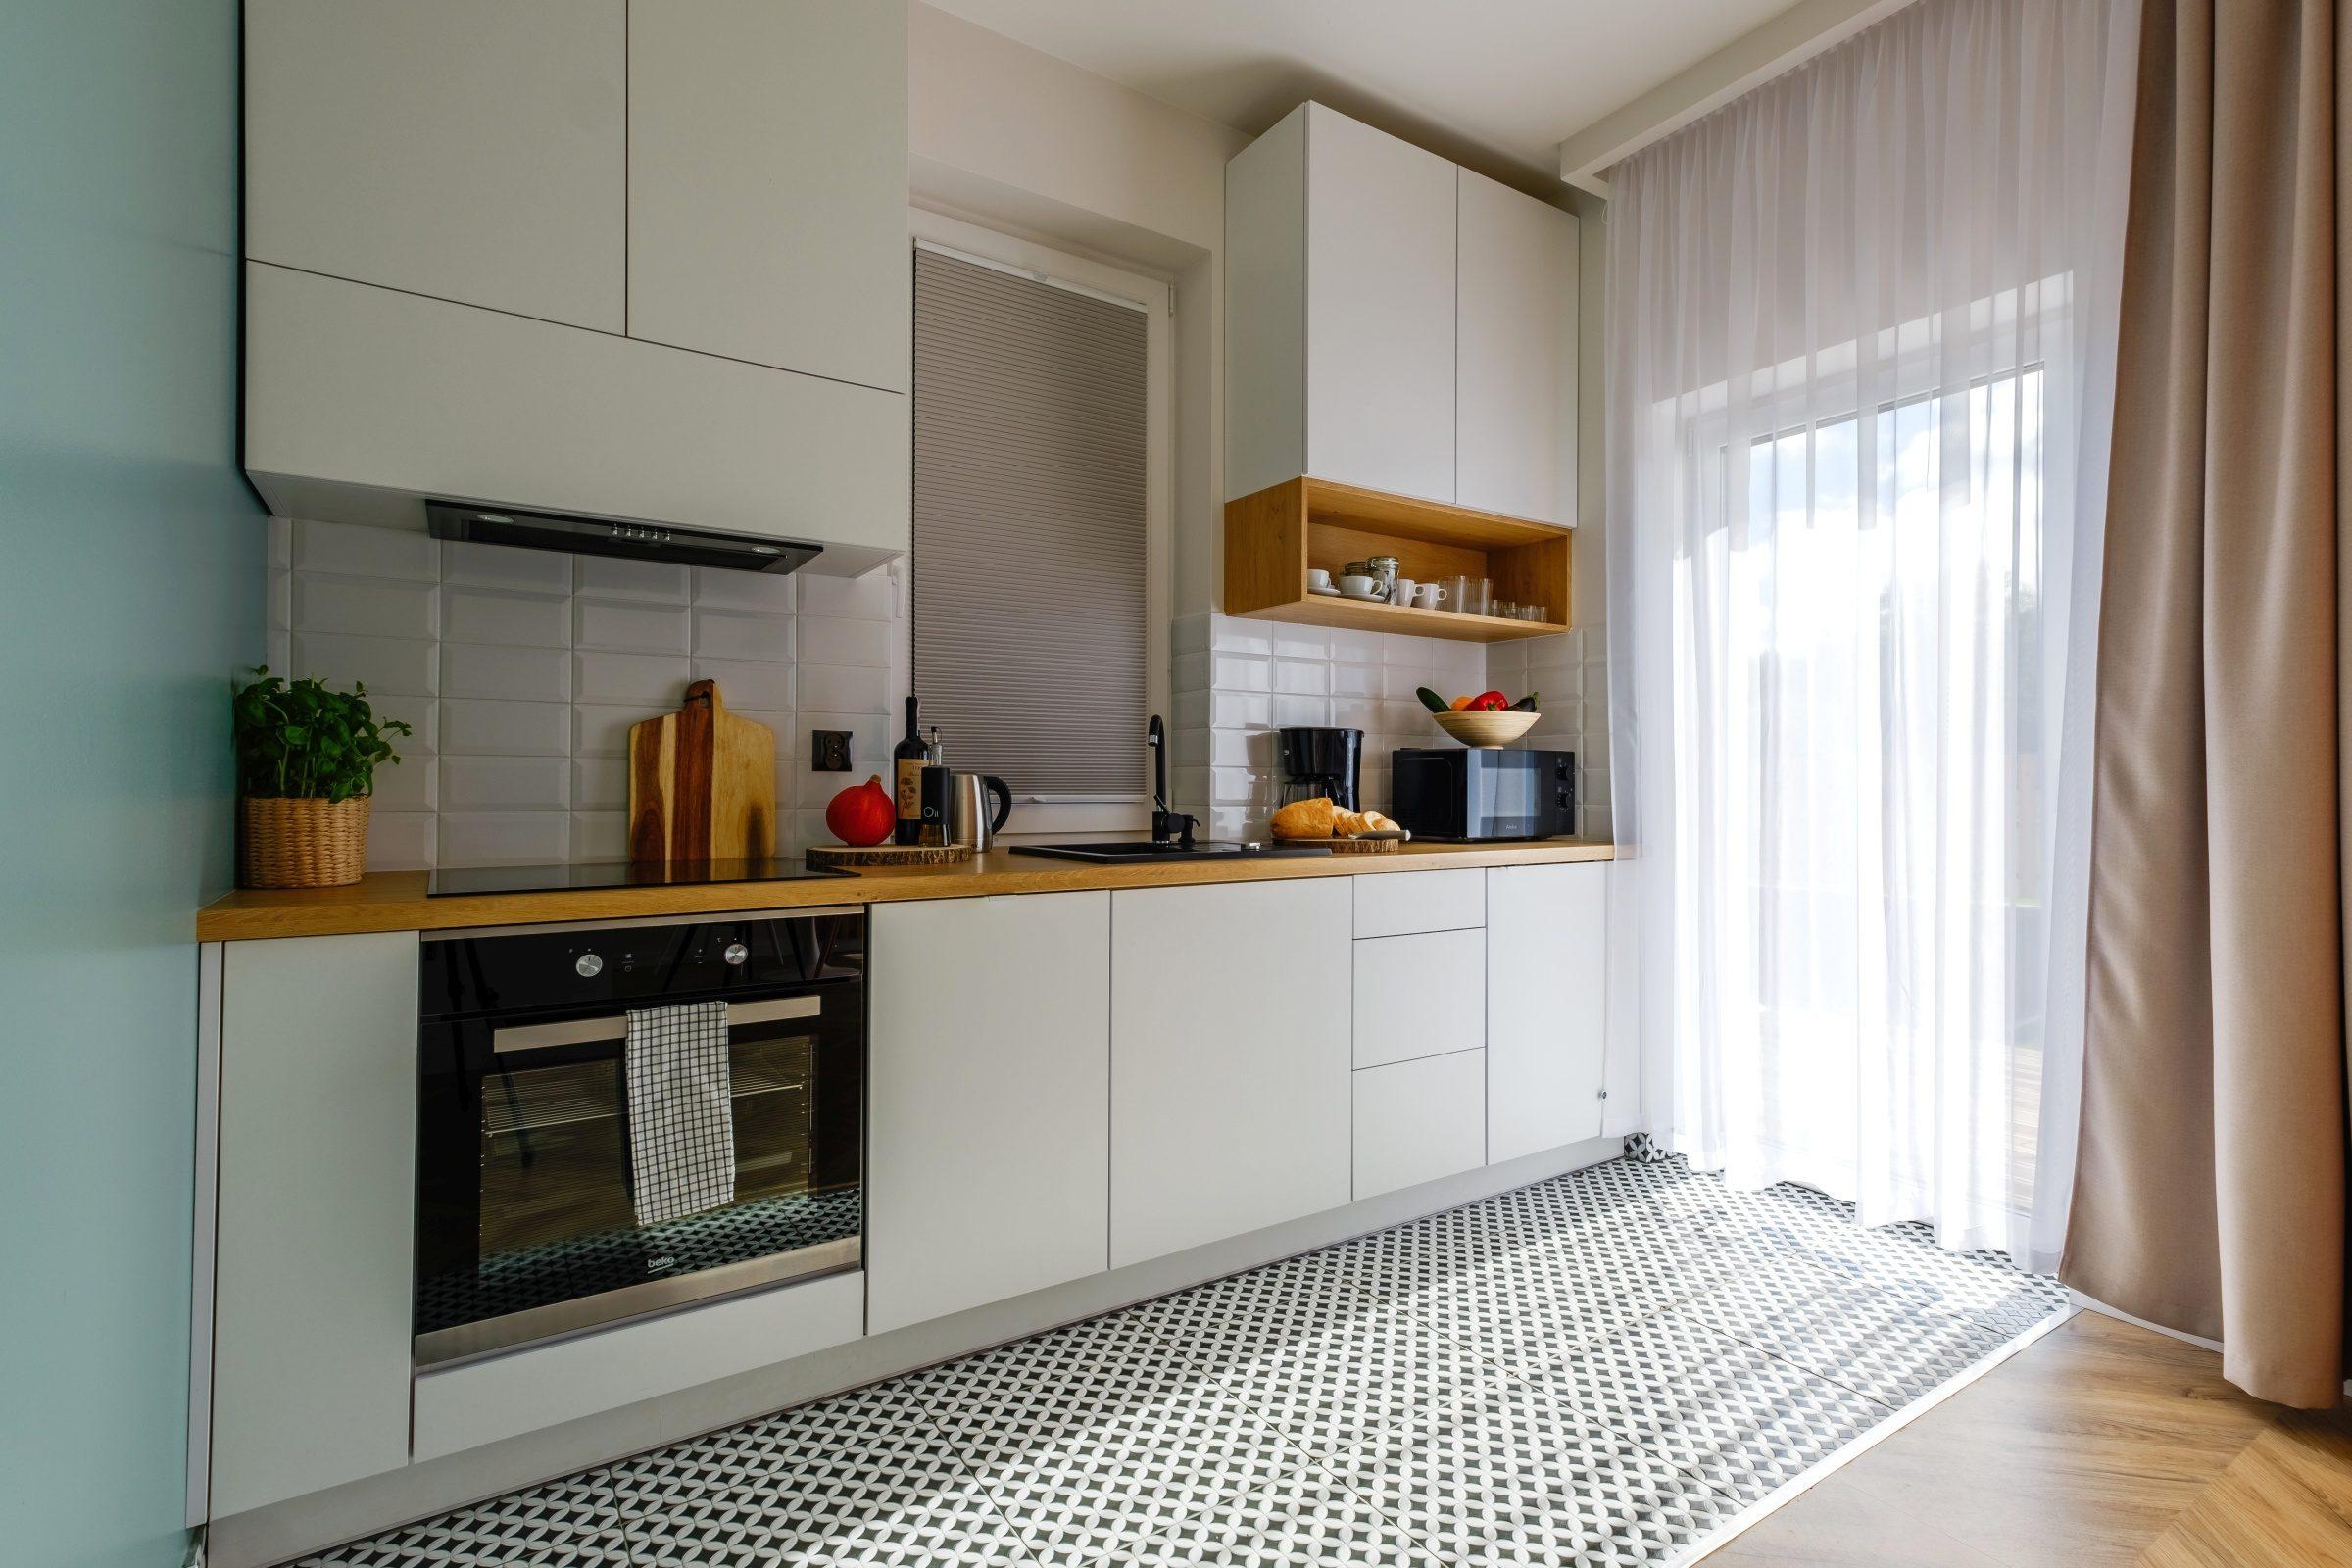 Apartamenty NOVA BIAŁKA Białka Tatrzańska apartament 7 aneks kuchenny